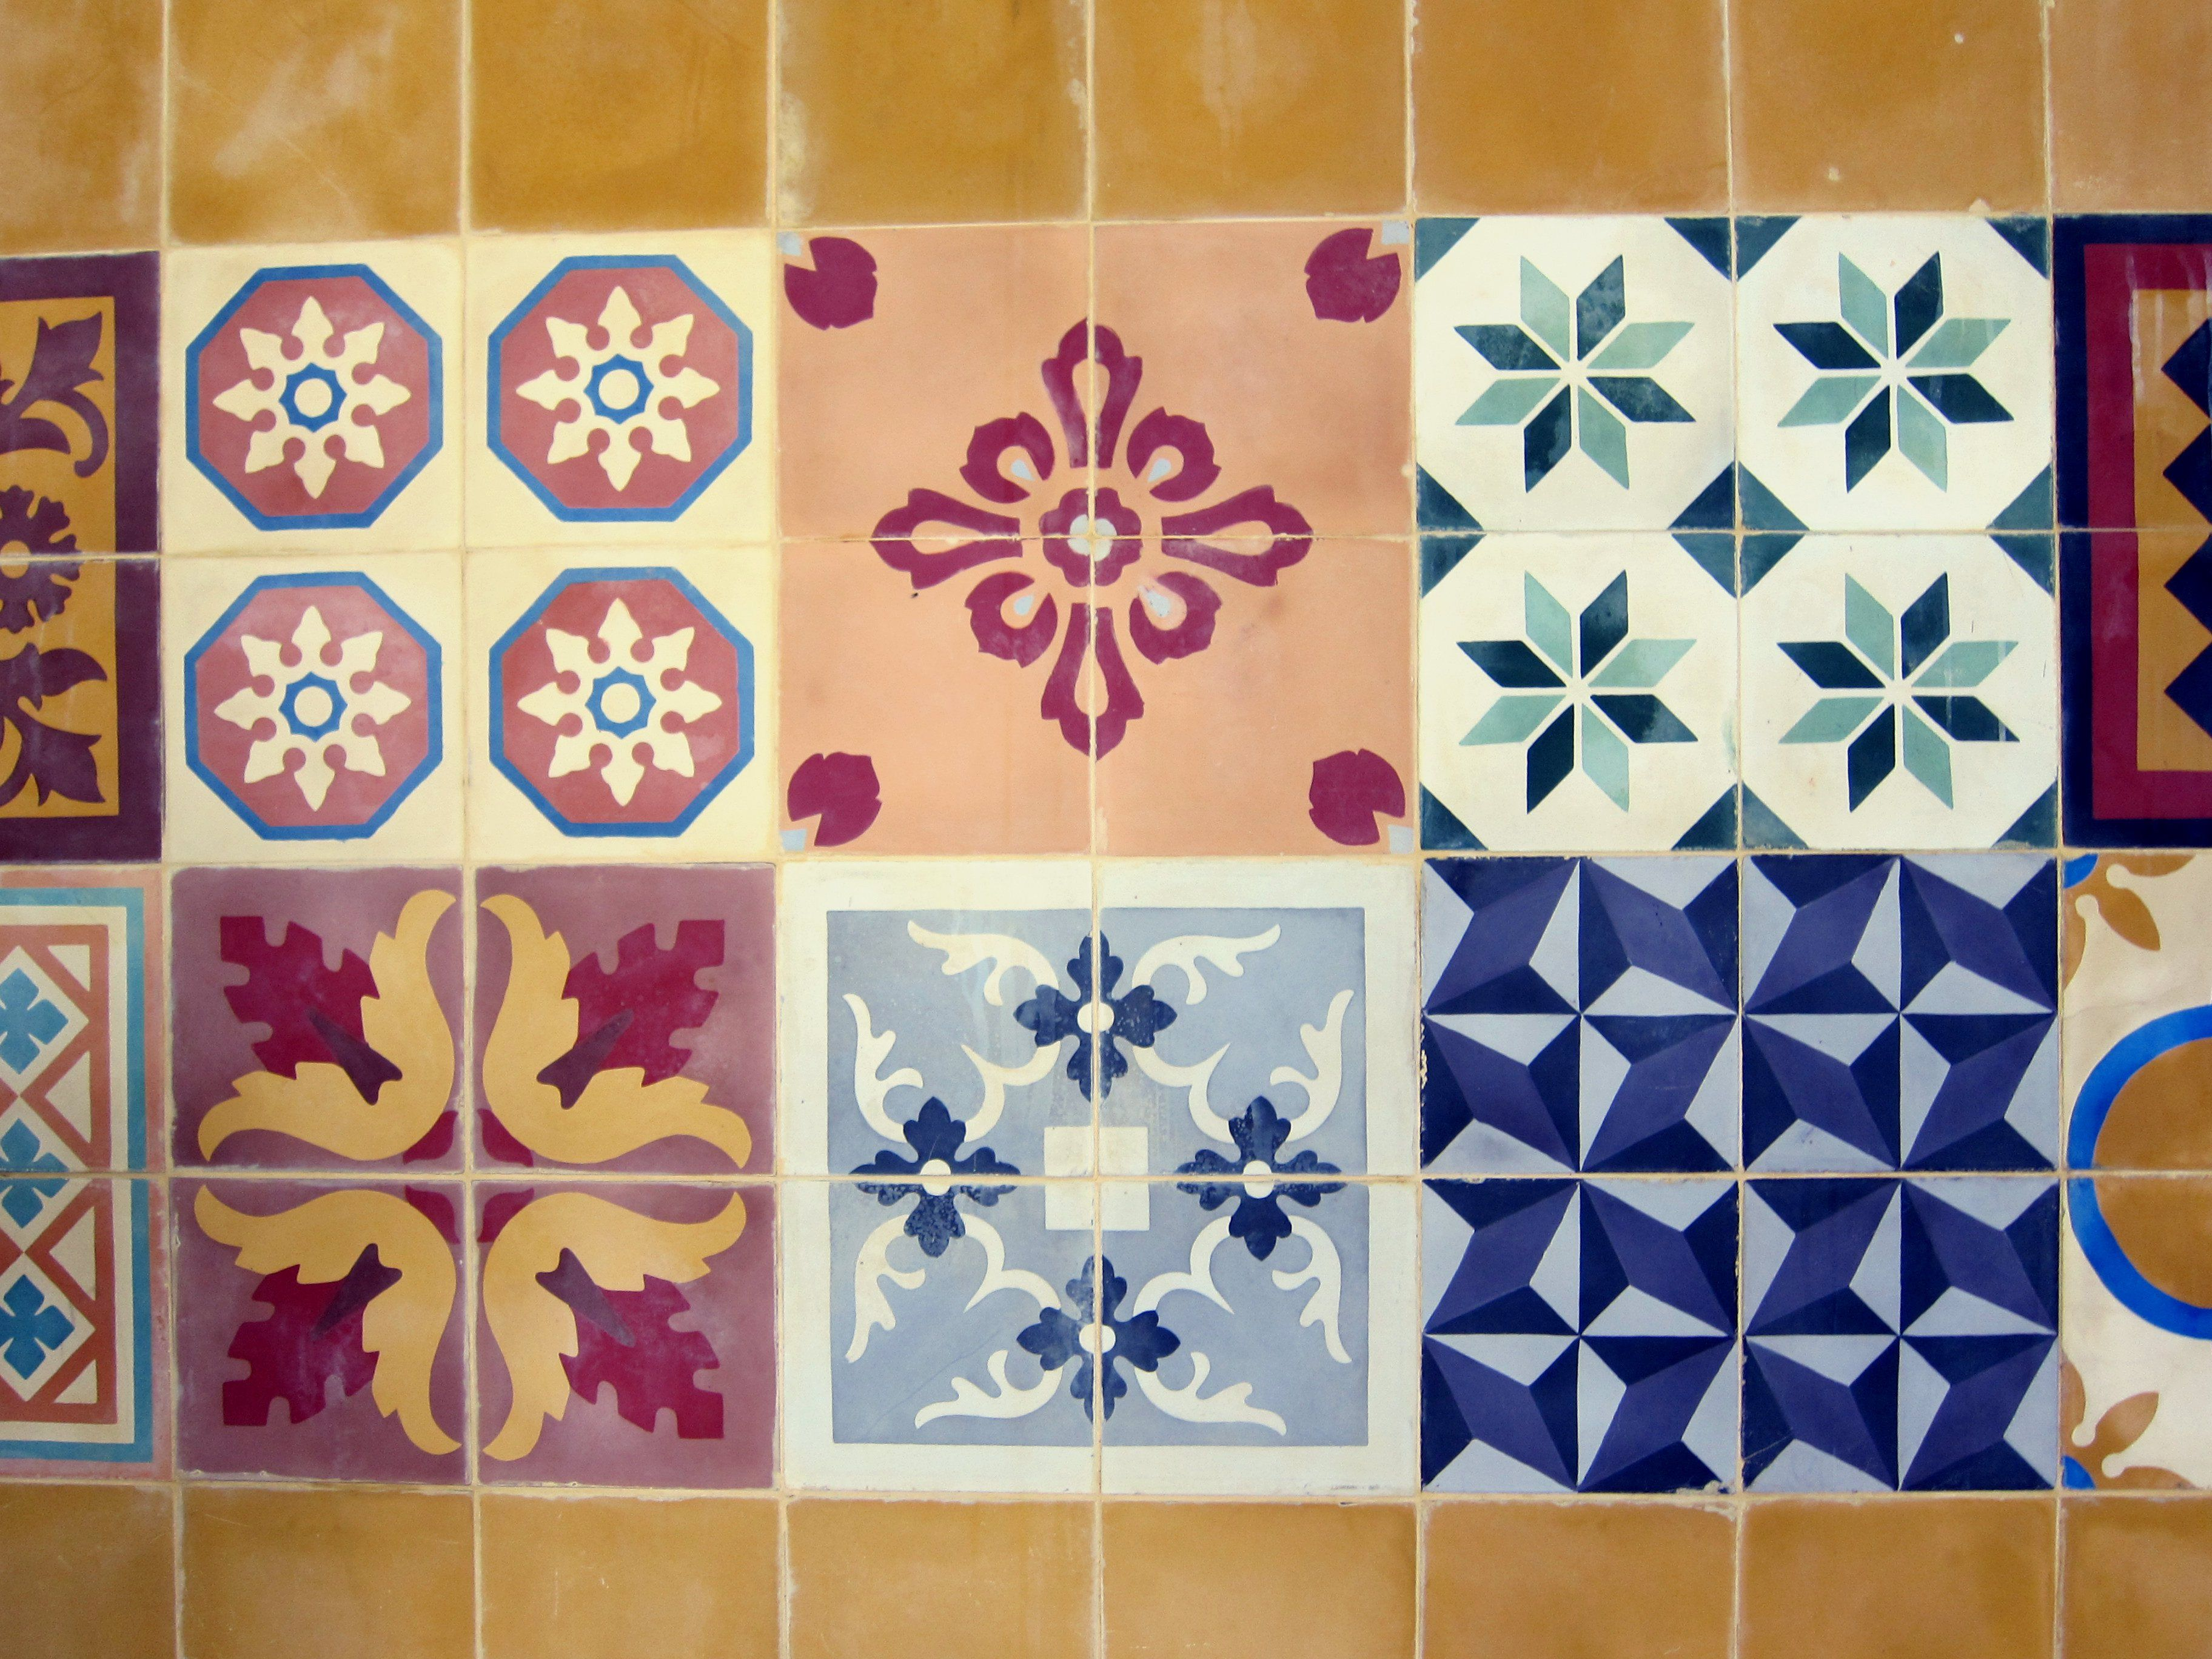 WARNA WARNI TEGEL KUNCI Cool Handmade Tiles from Yogyakarta Indonesia I mean it handmade